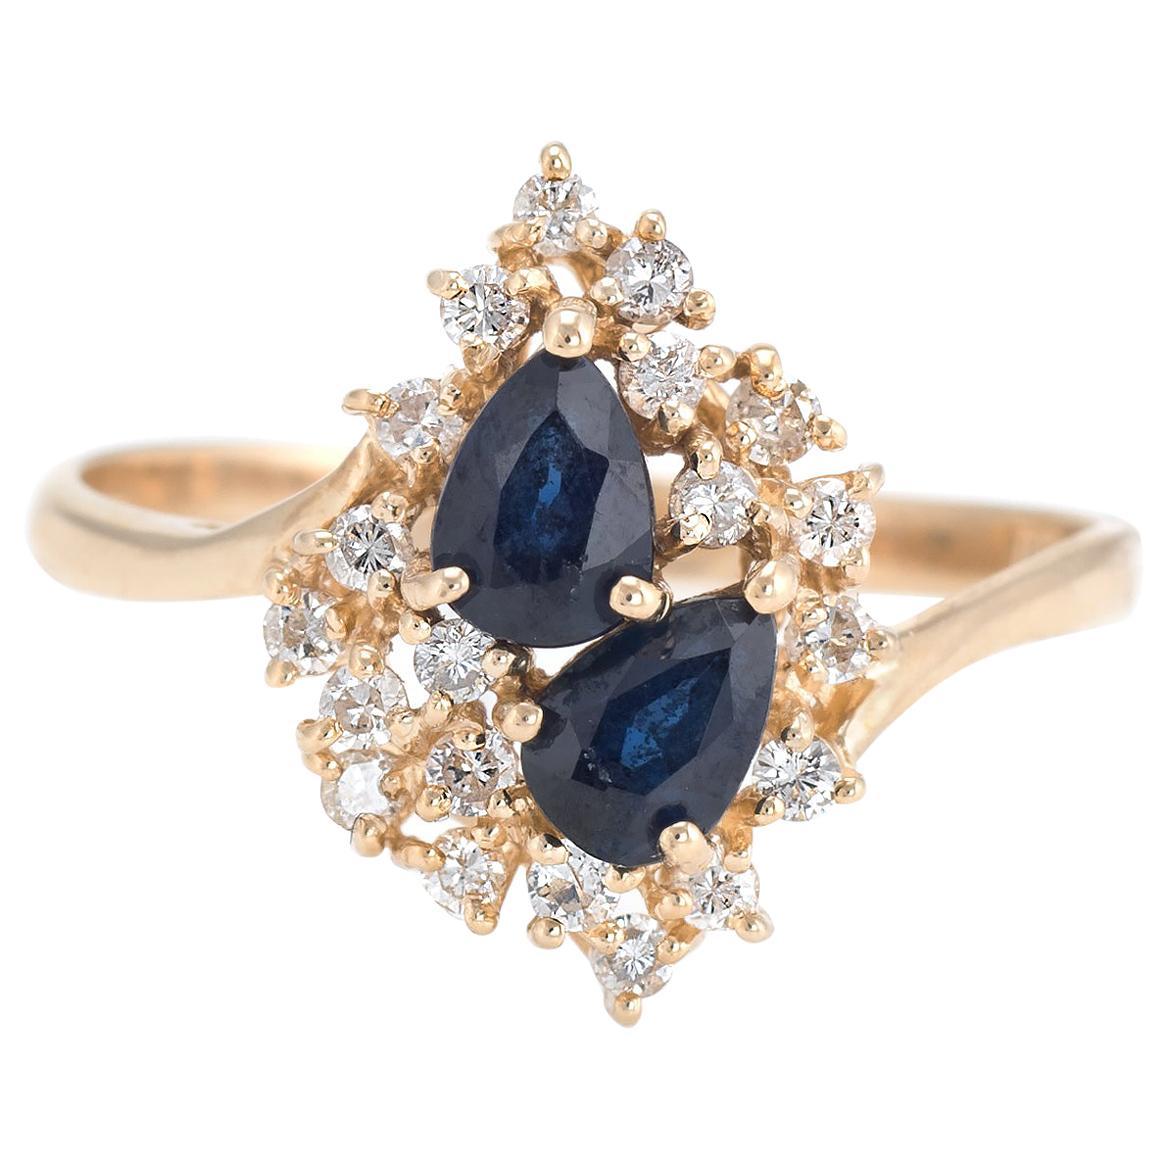 Sapphire Diamond Cluster Ring Vintage 14 Karat Yellow Gold Estate Fine Jewelry